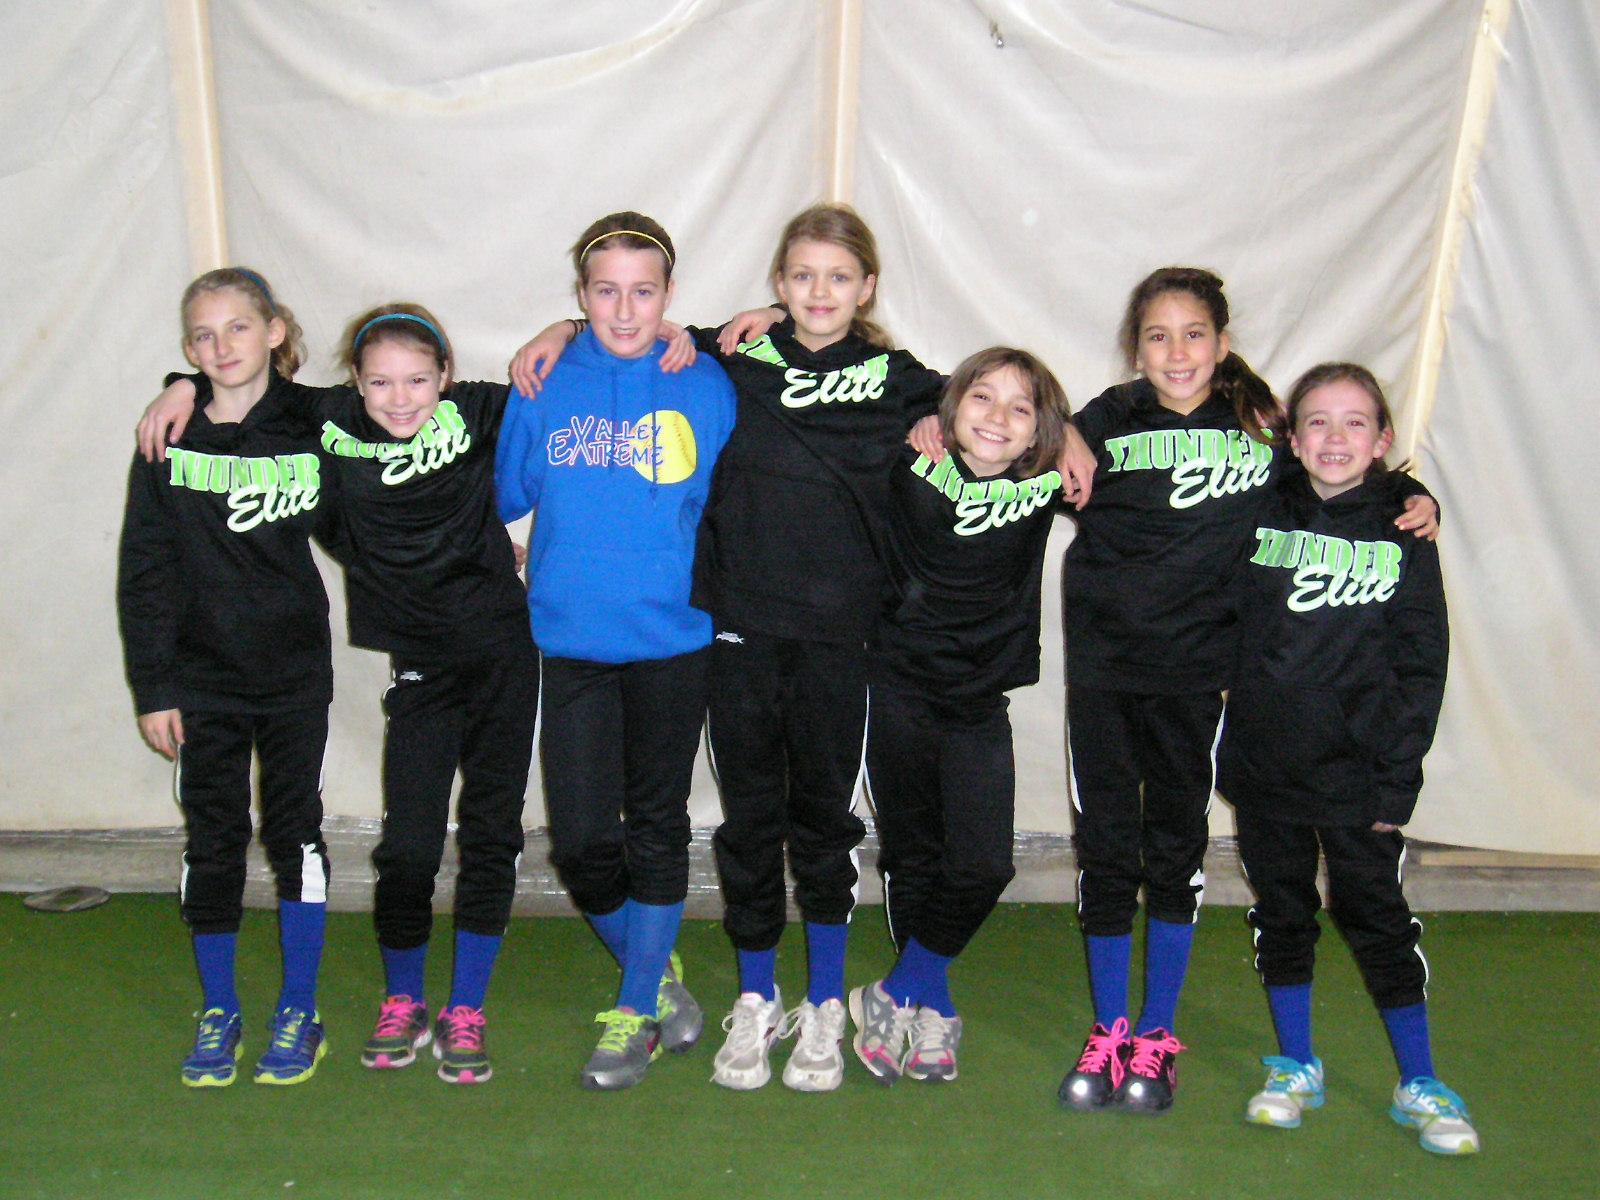 ohio fastpitch softball travel teams